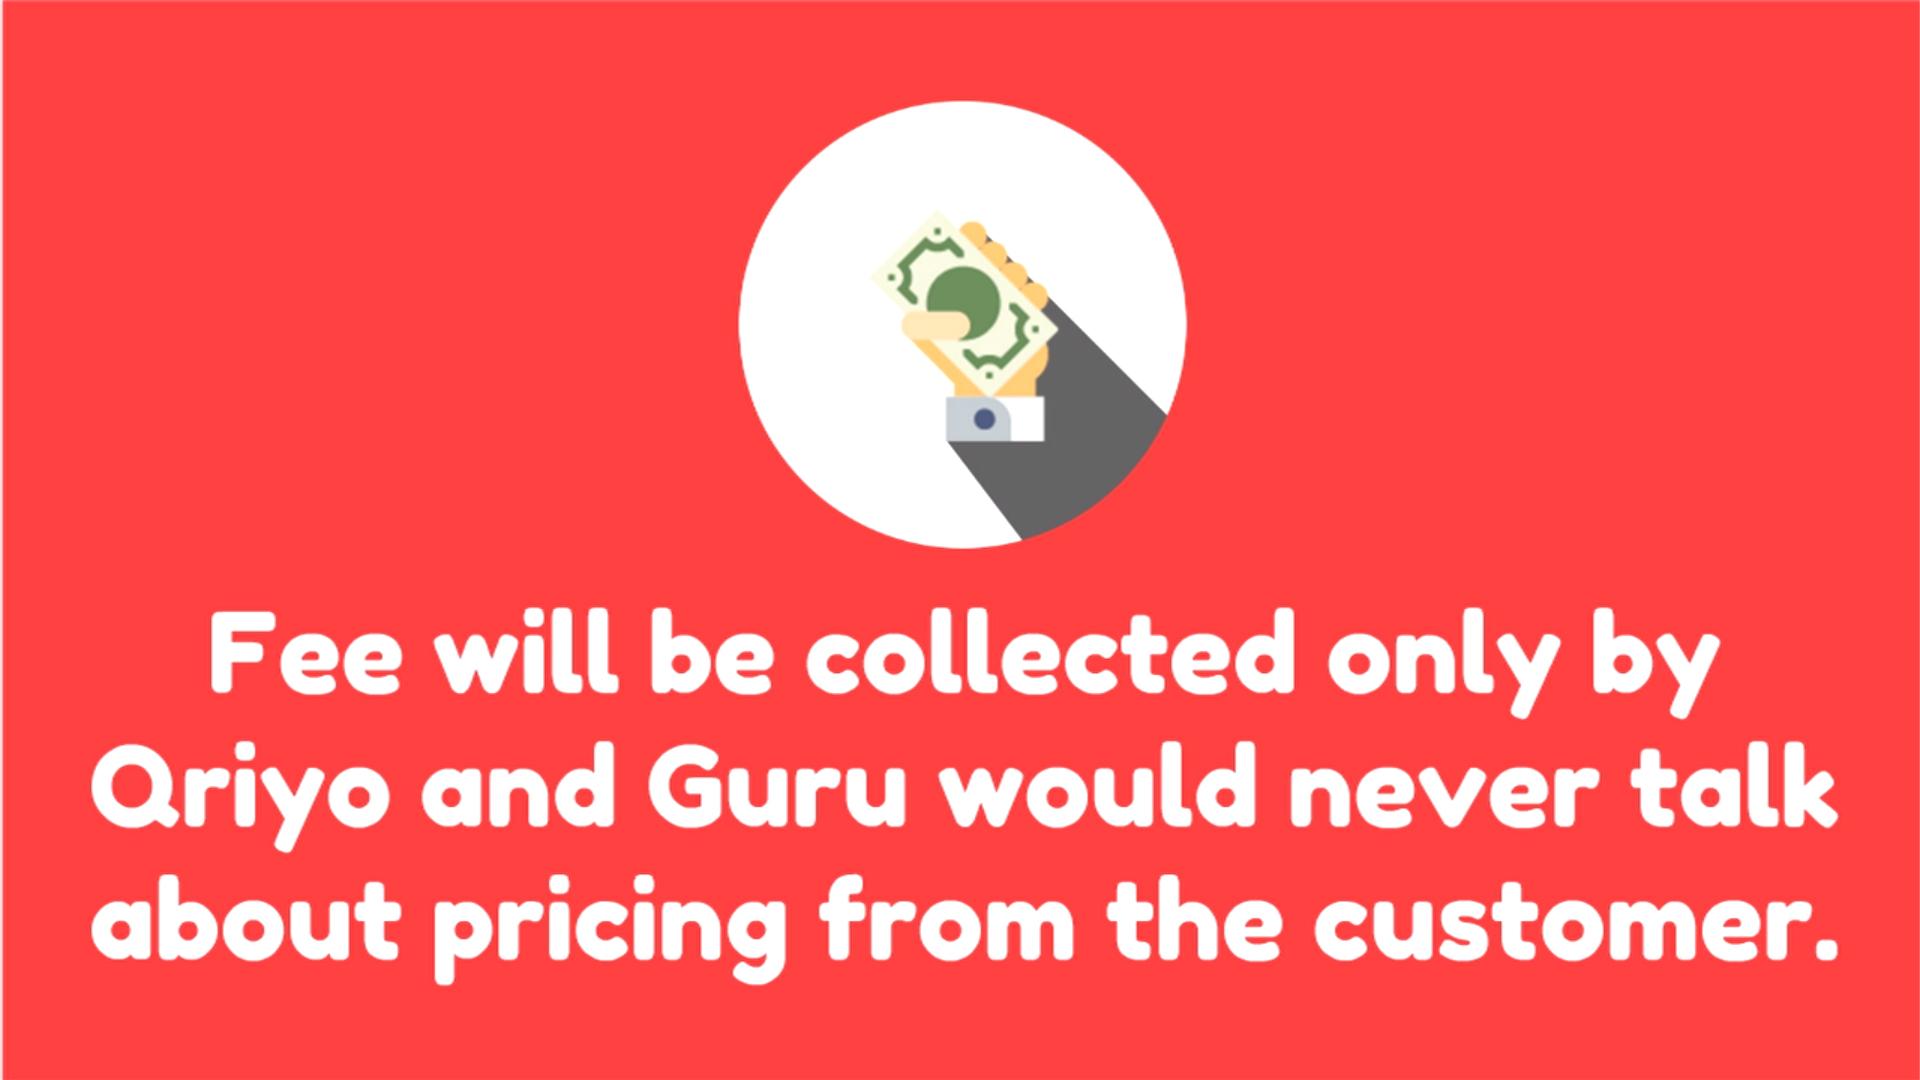 Guidelines for qriyo gurus